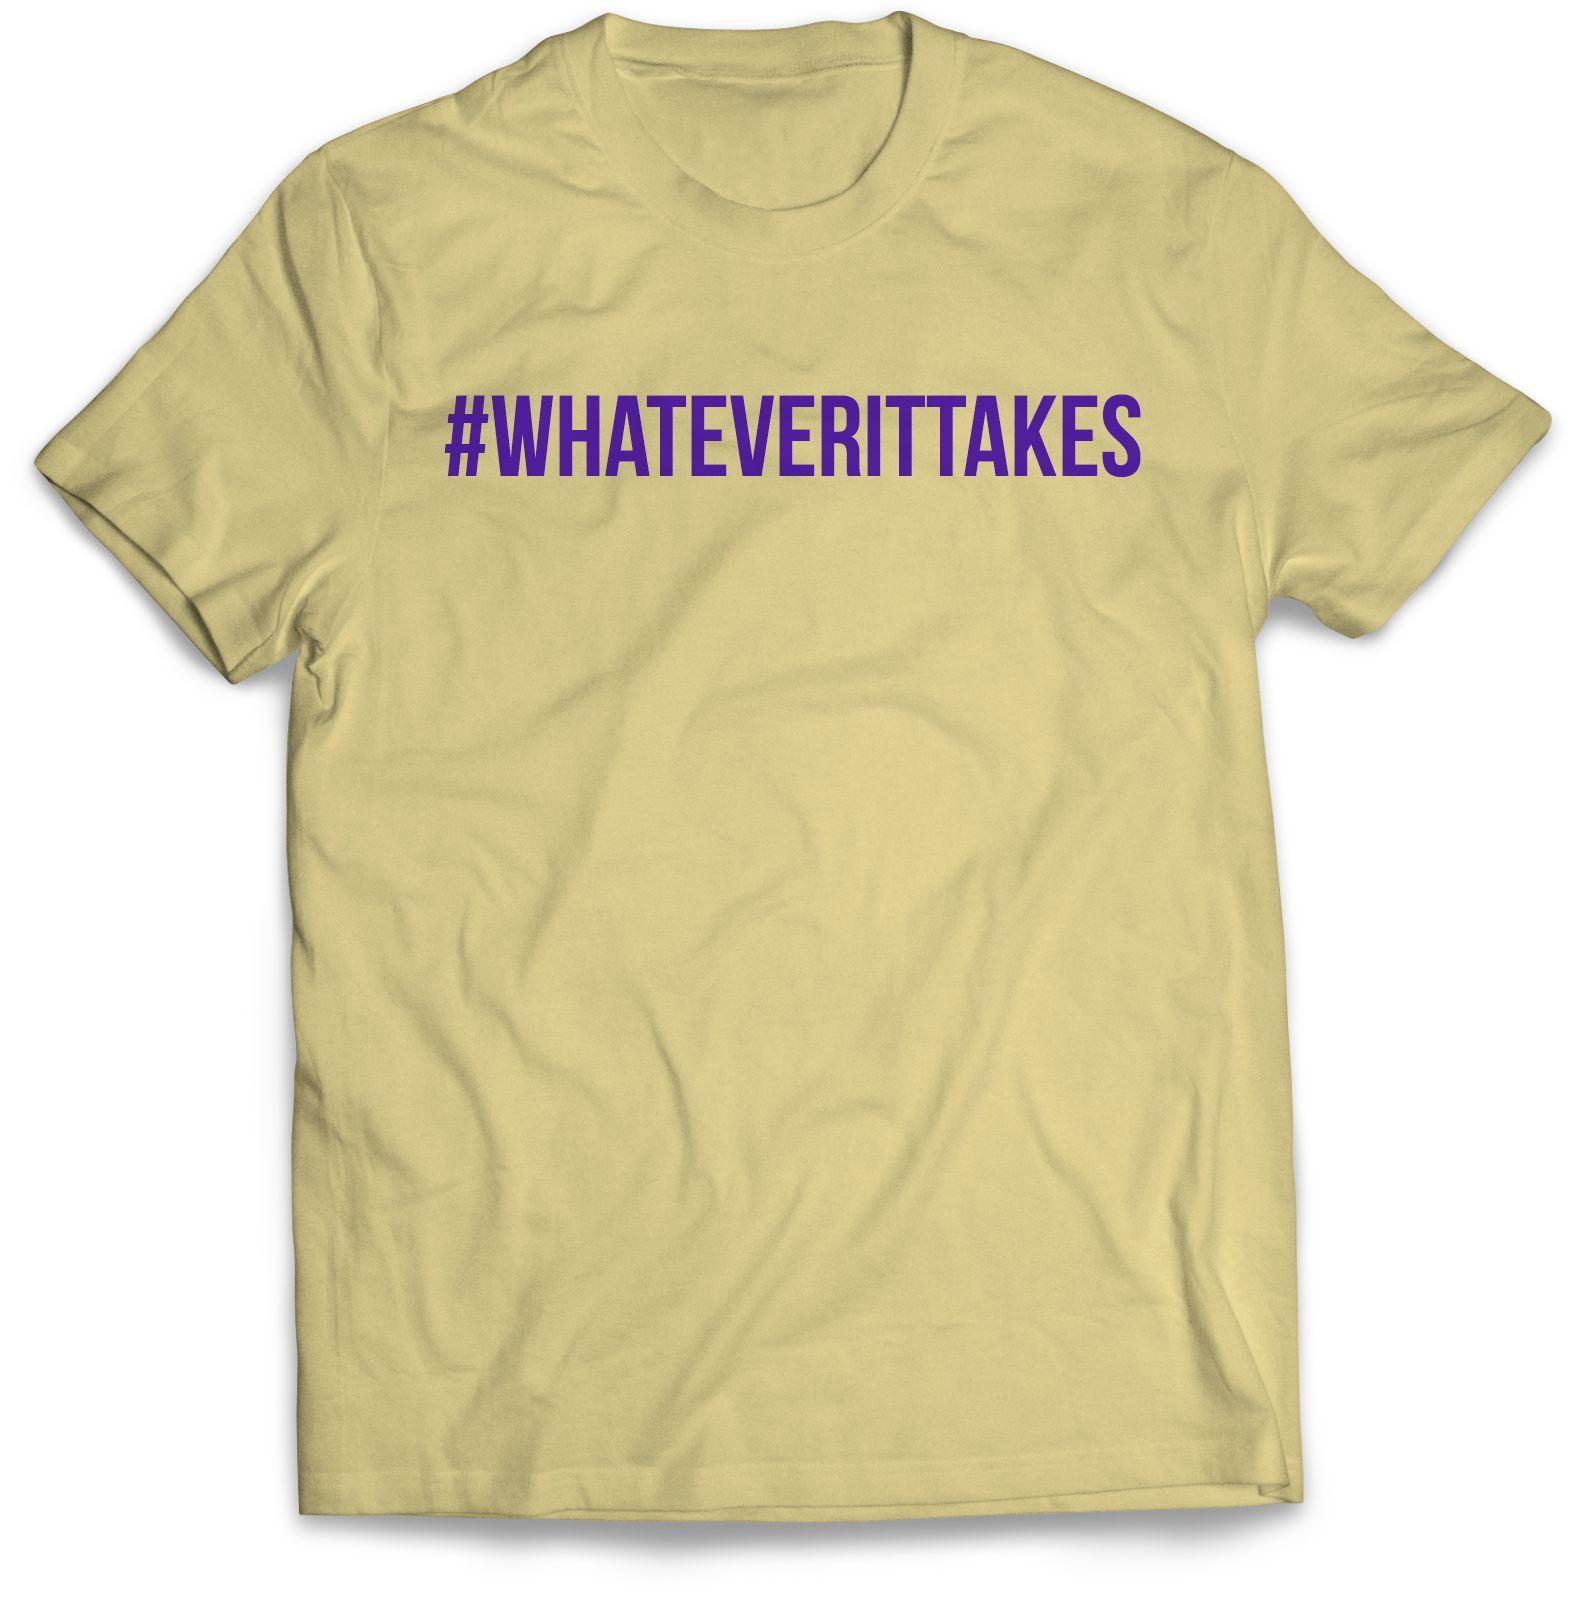 #Whateverittakes